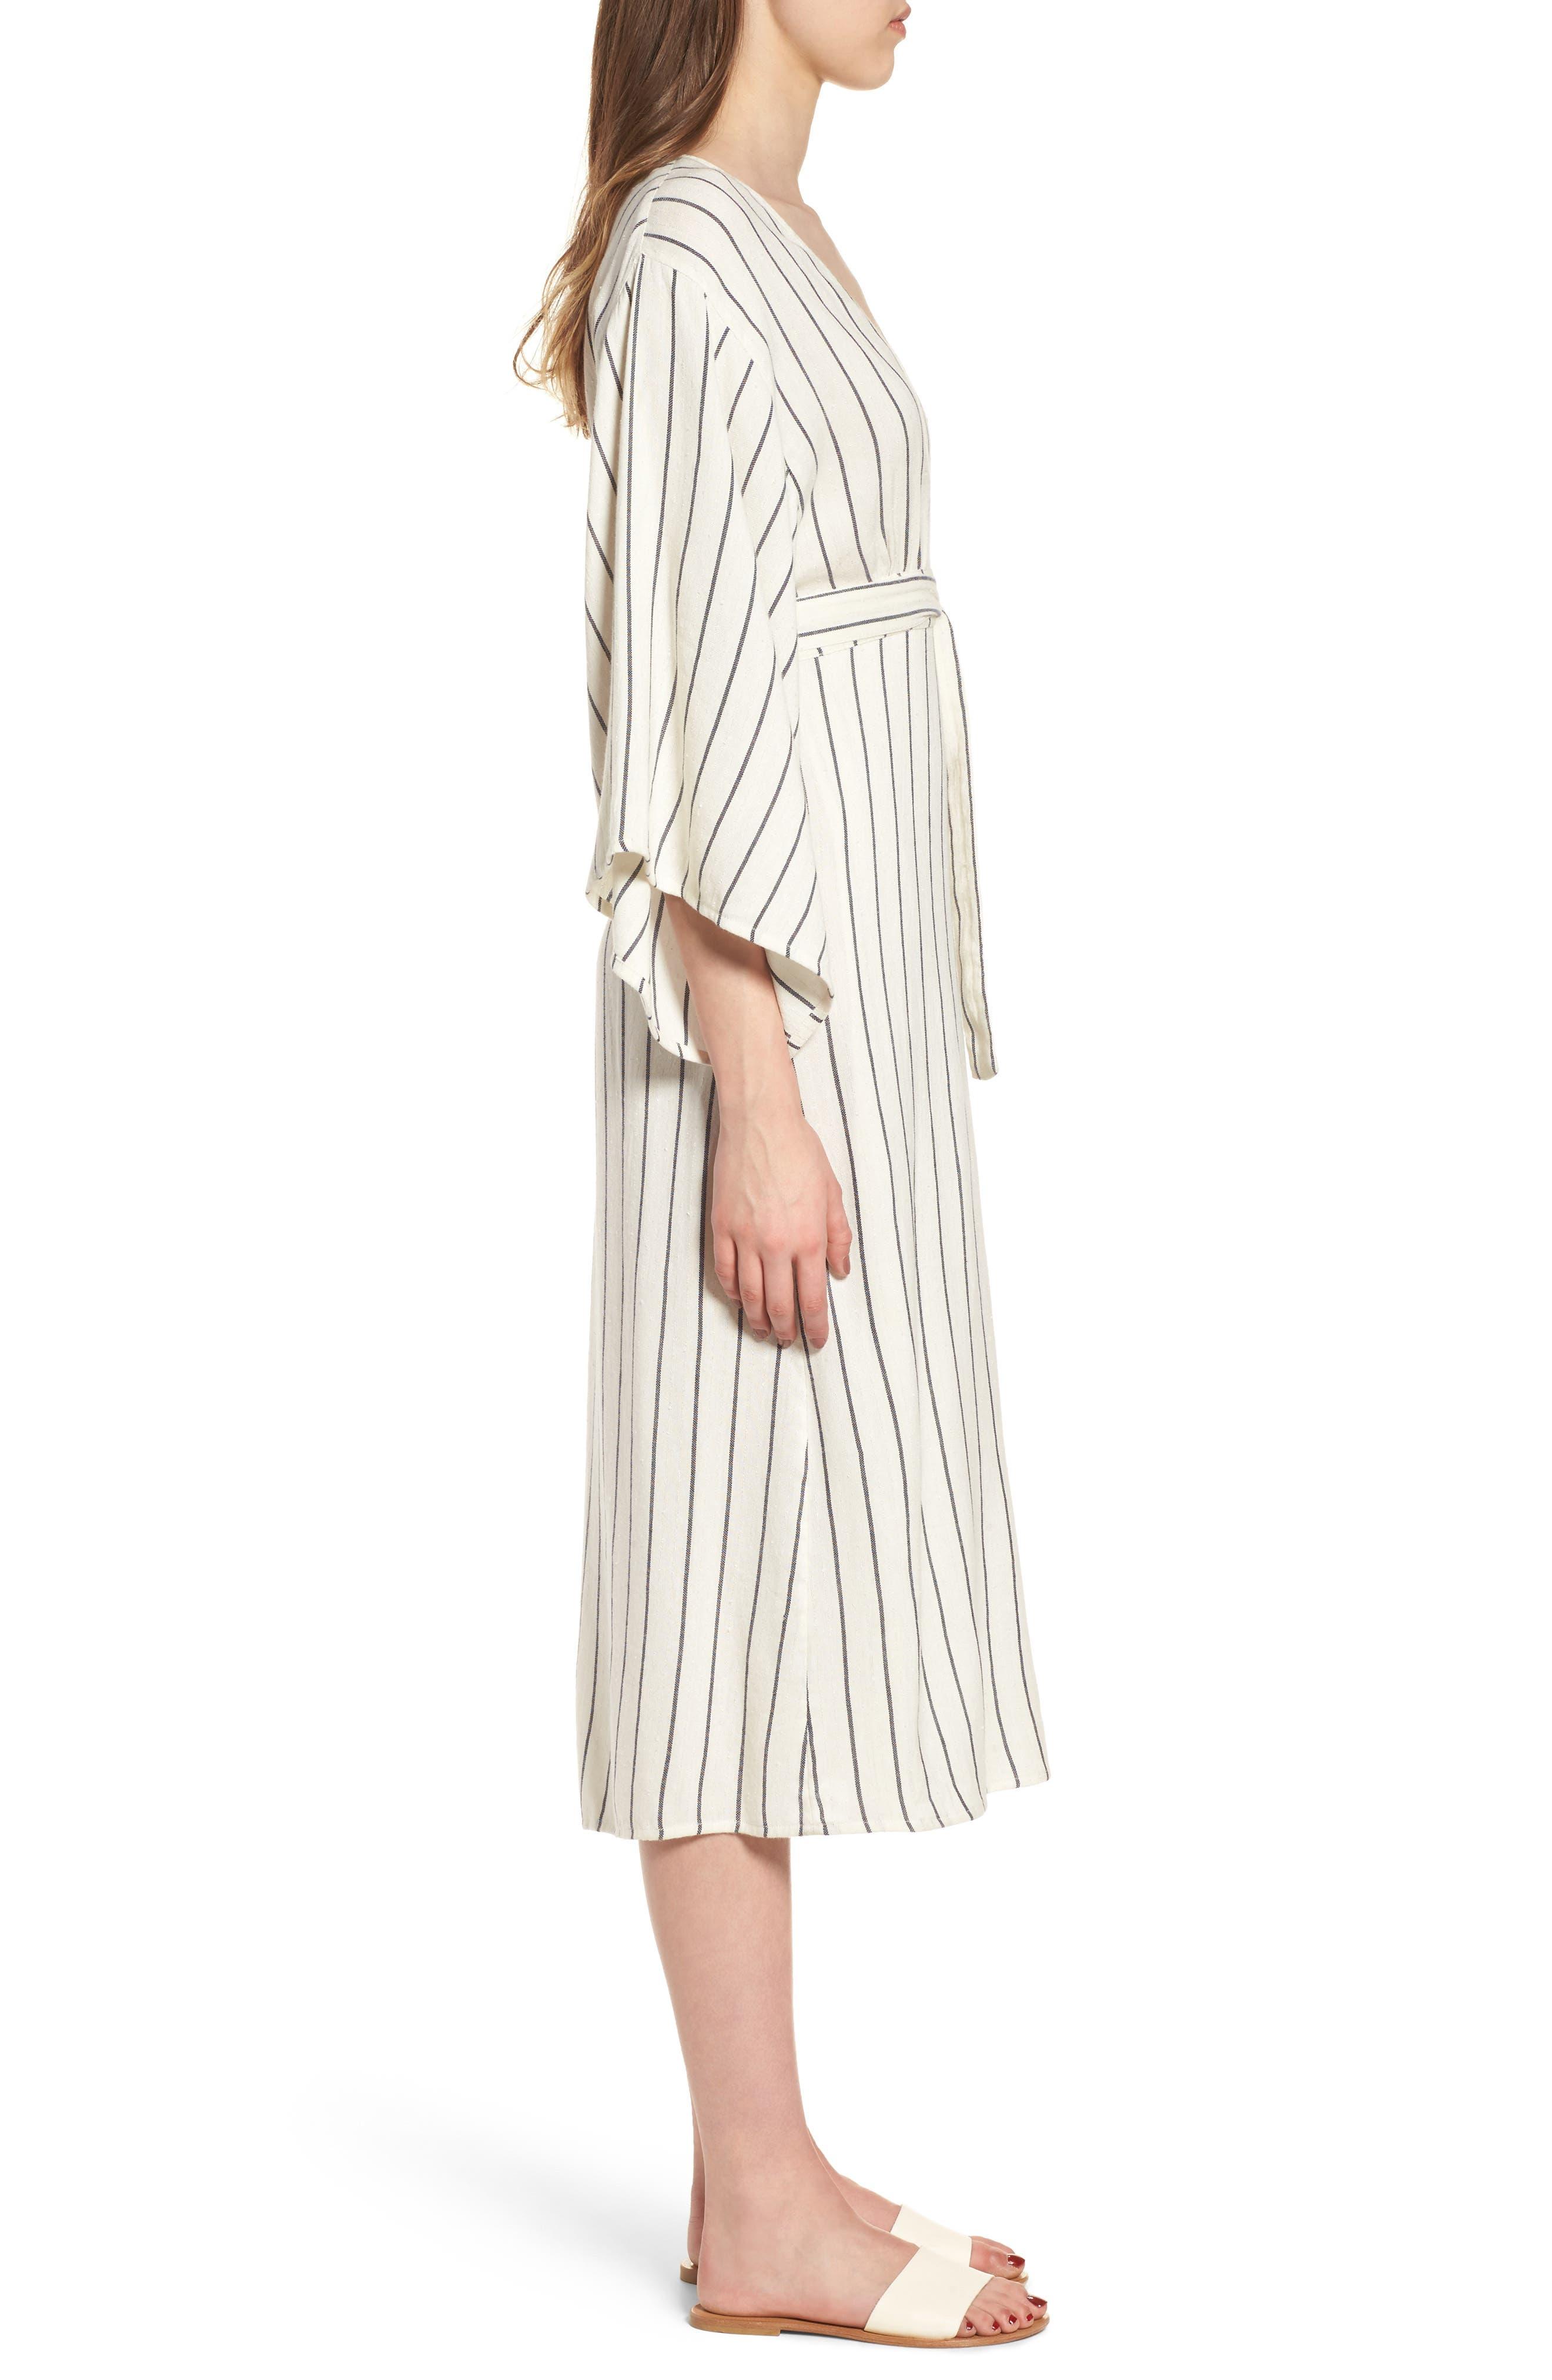 Robe Life Striped Midi Dress,                             Alternate thumbnail 3, color,                             Cool Wip